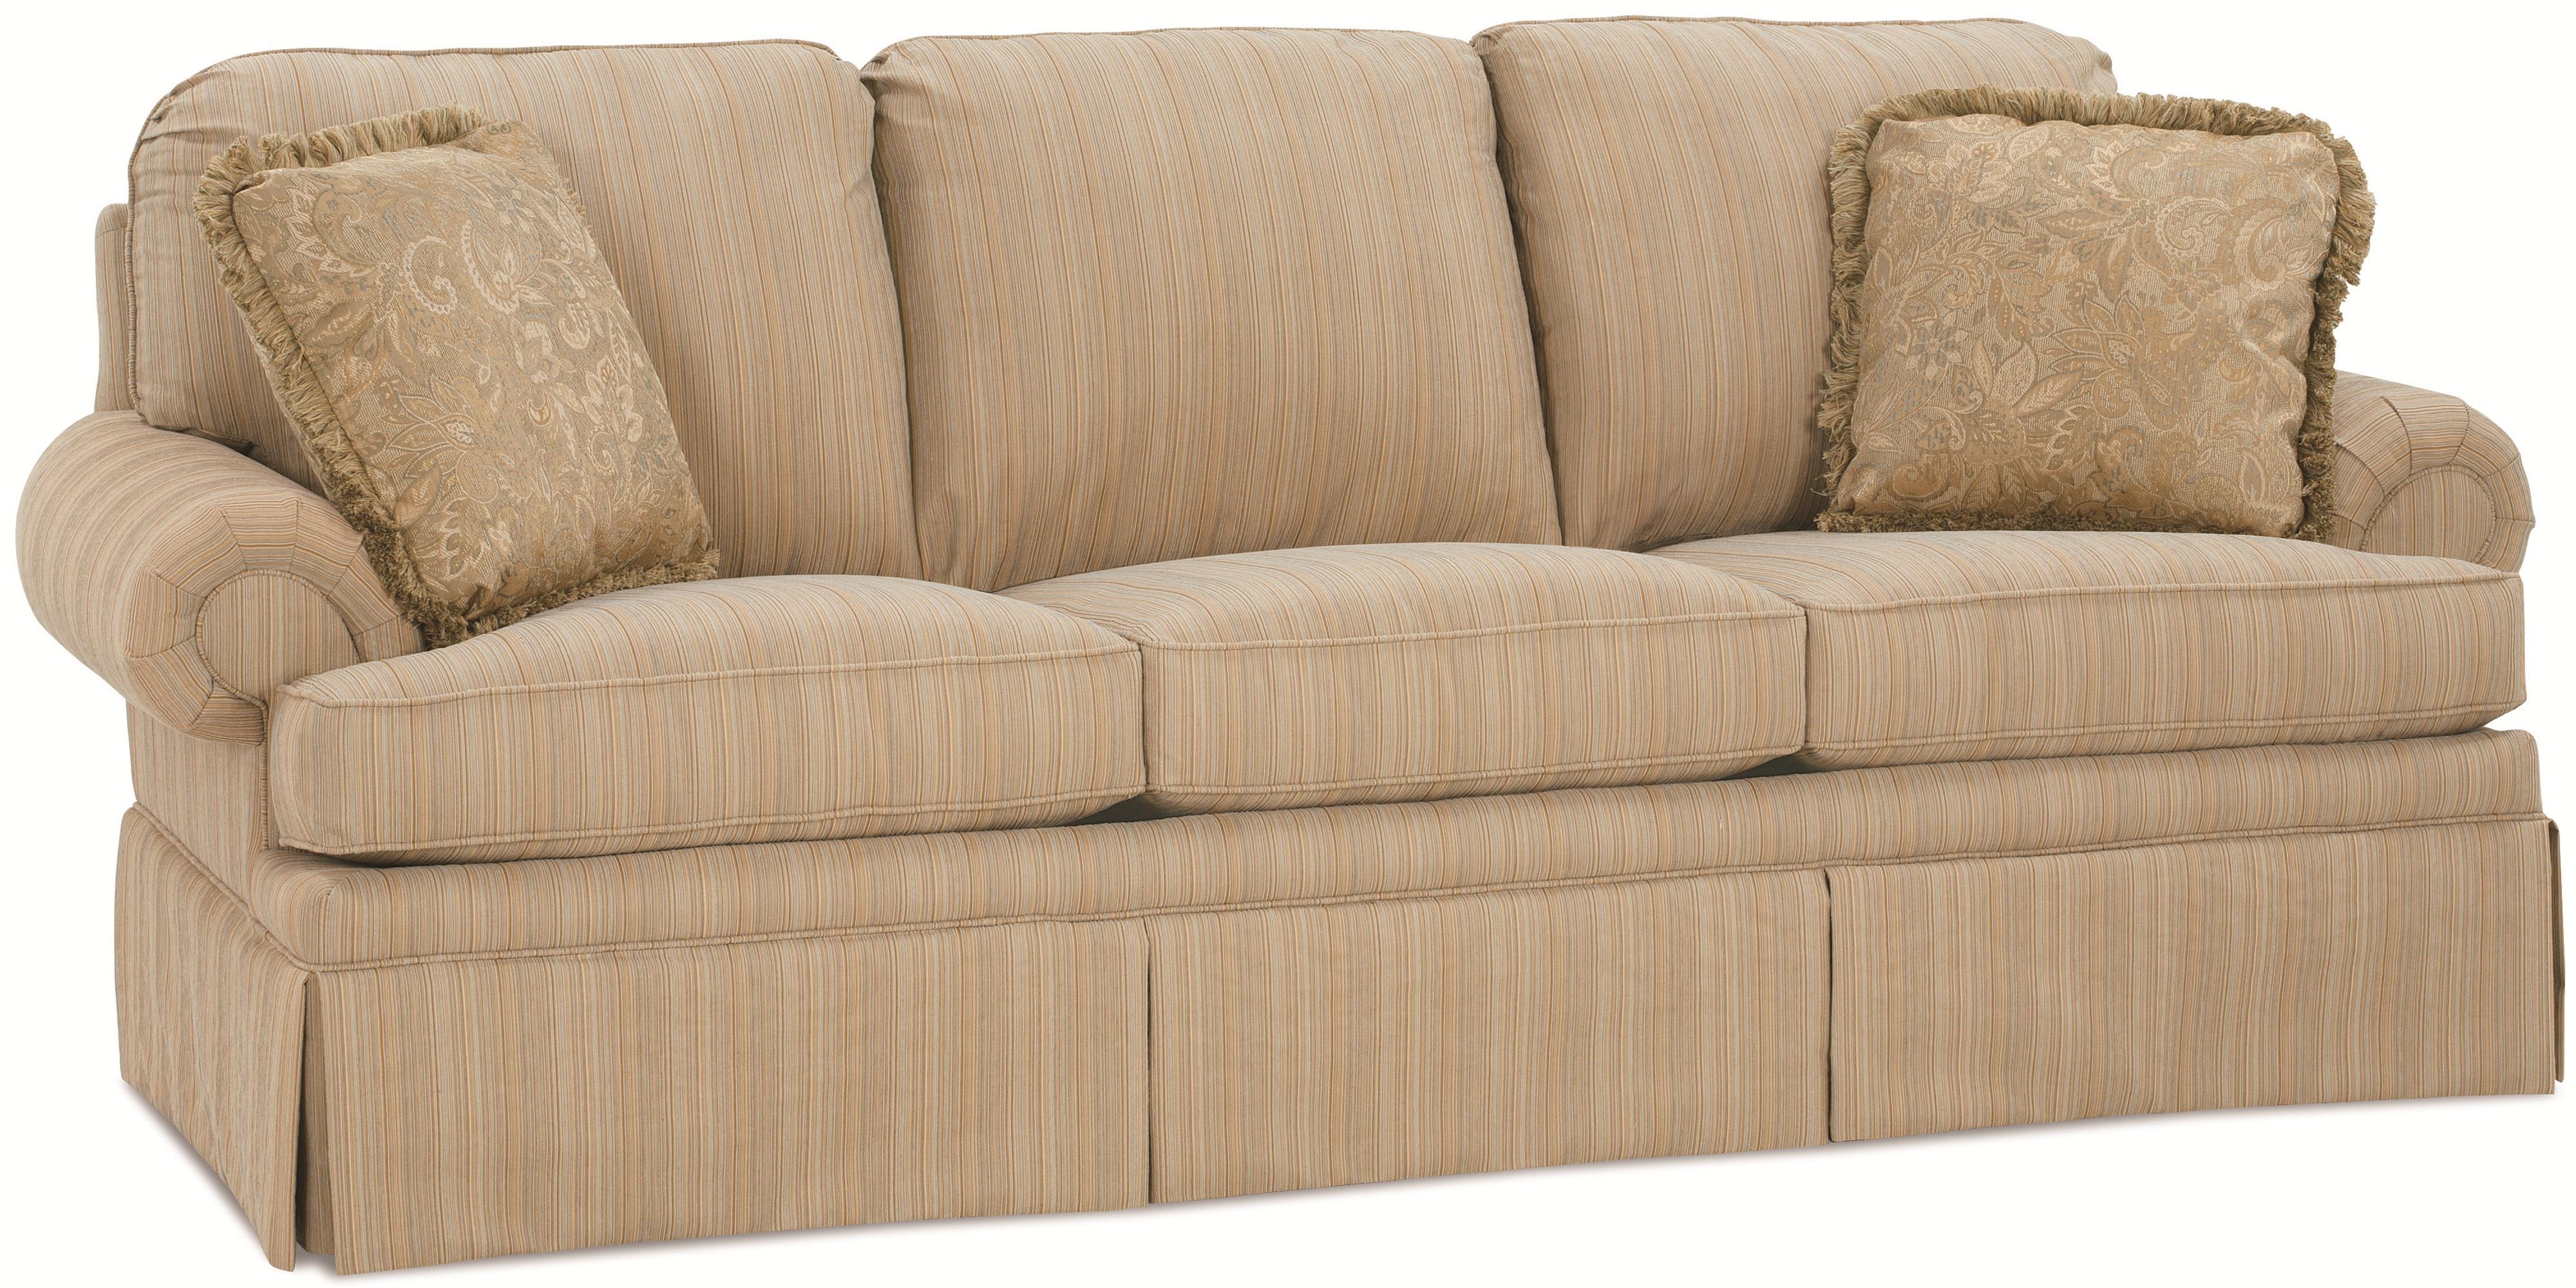 Clayton Marcus 3189 87 Semi Attached Back Traditional Sofa Ahfa Accent Sofas Dealer Locator